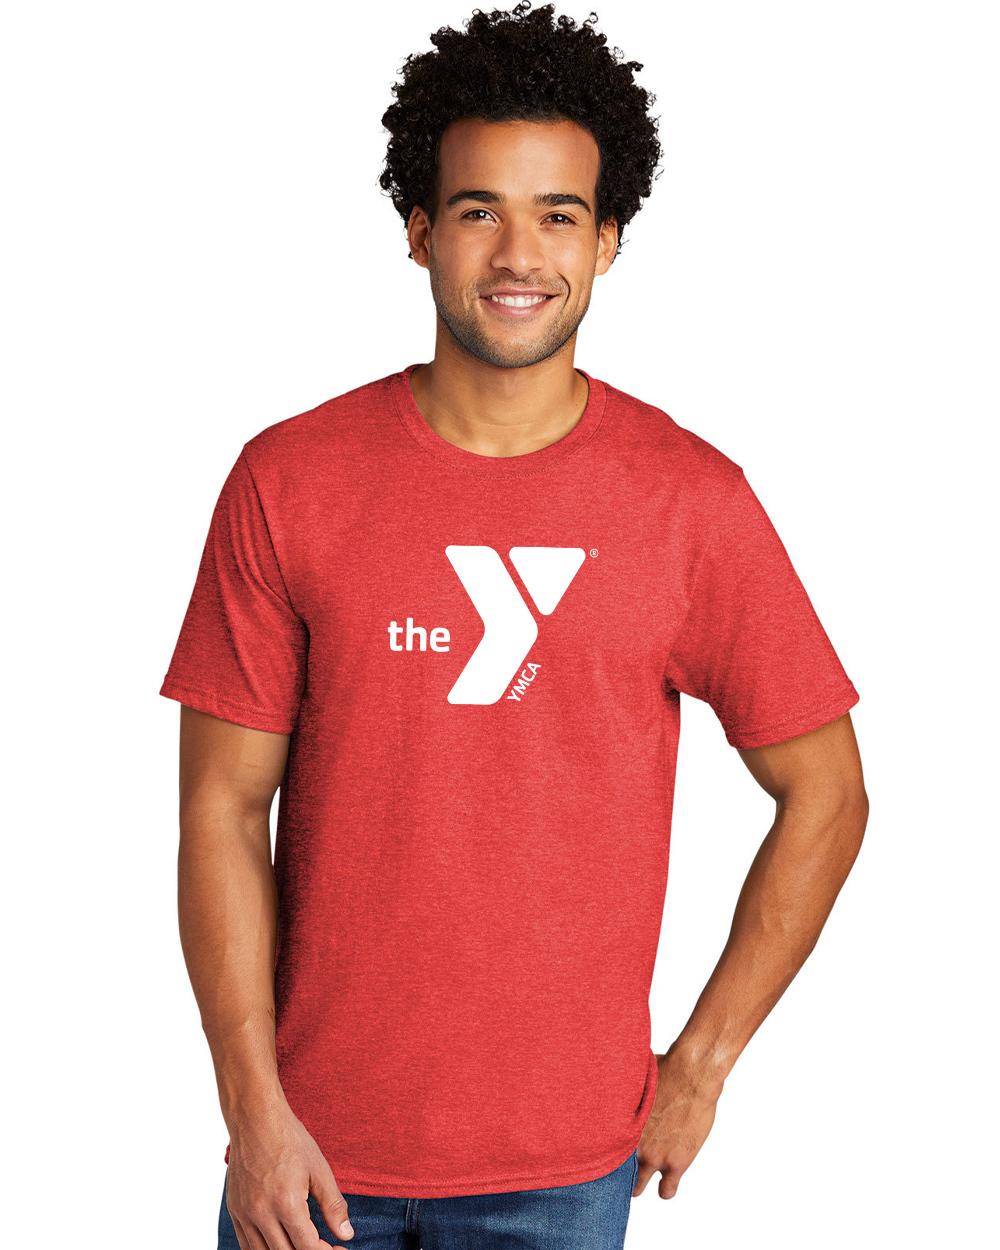 YMCA Spirit Wear subcategory image